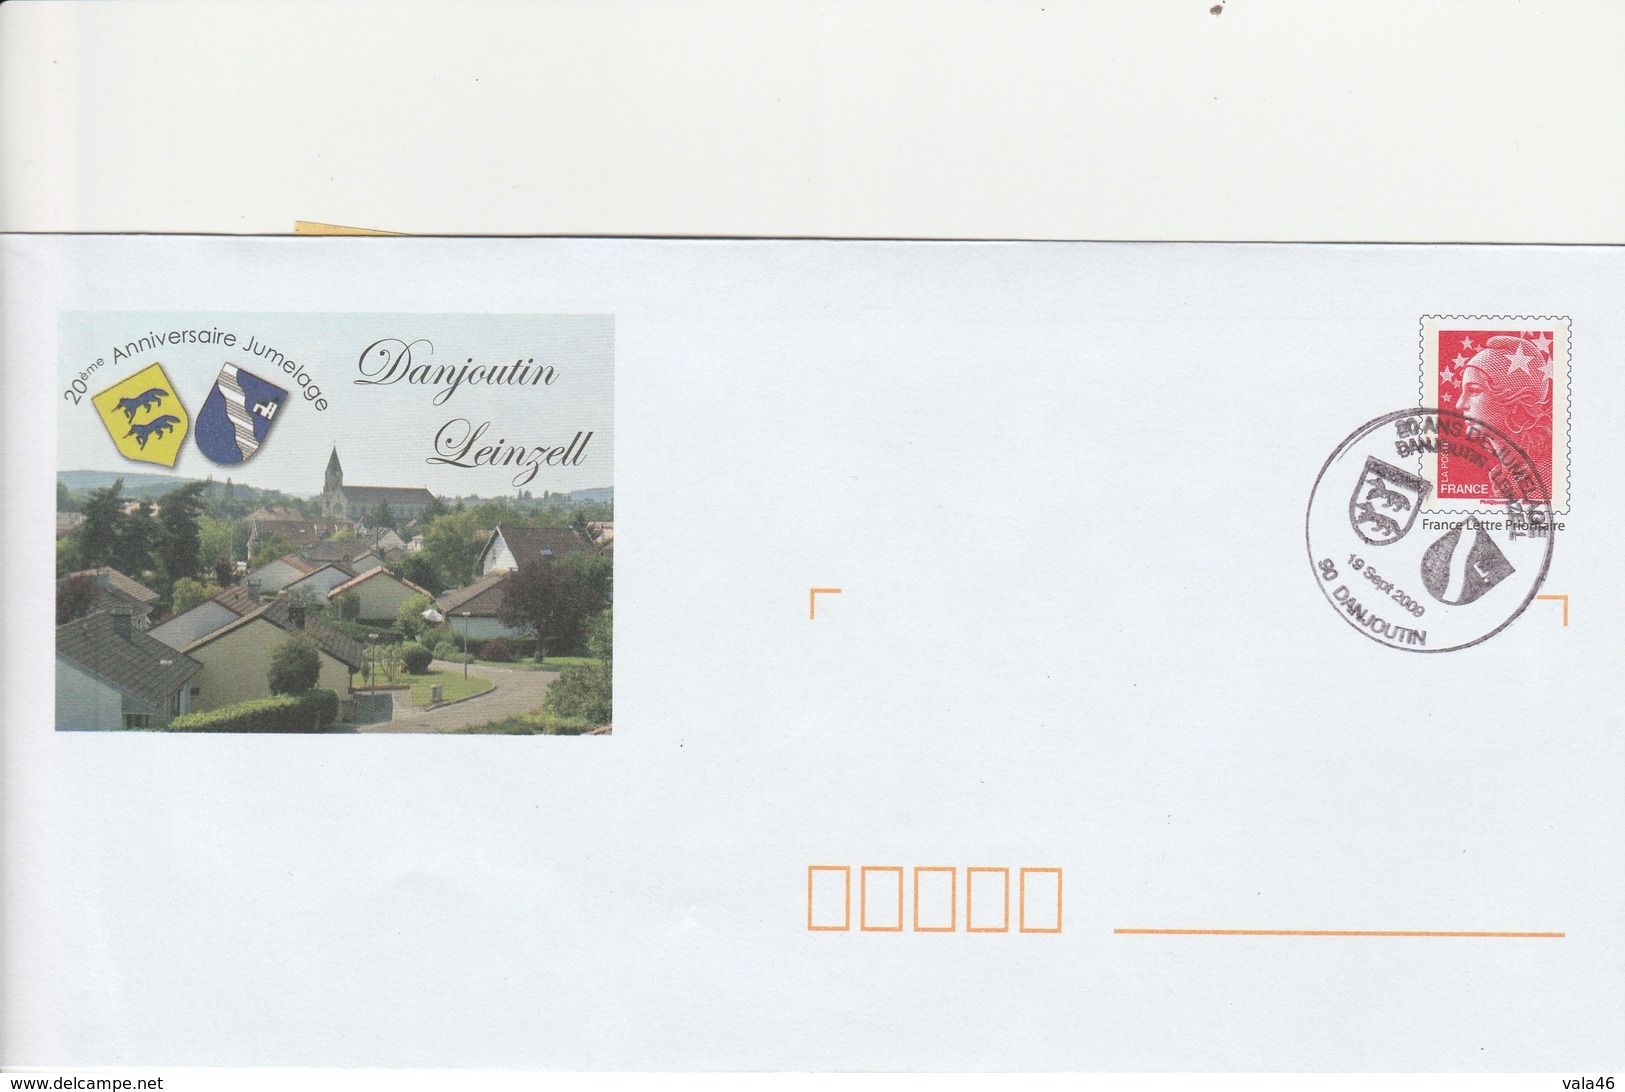 MARCOPHILIE  MARIANNE DE BEAUJARD  N° 4230 SUR ENVELOPPE PRE-TIMBREE - Marcophilie (Lettres)